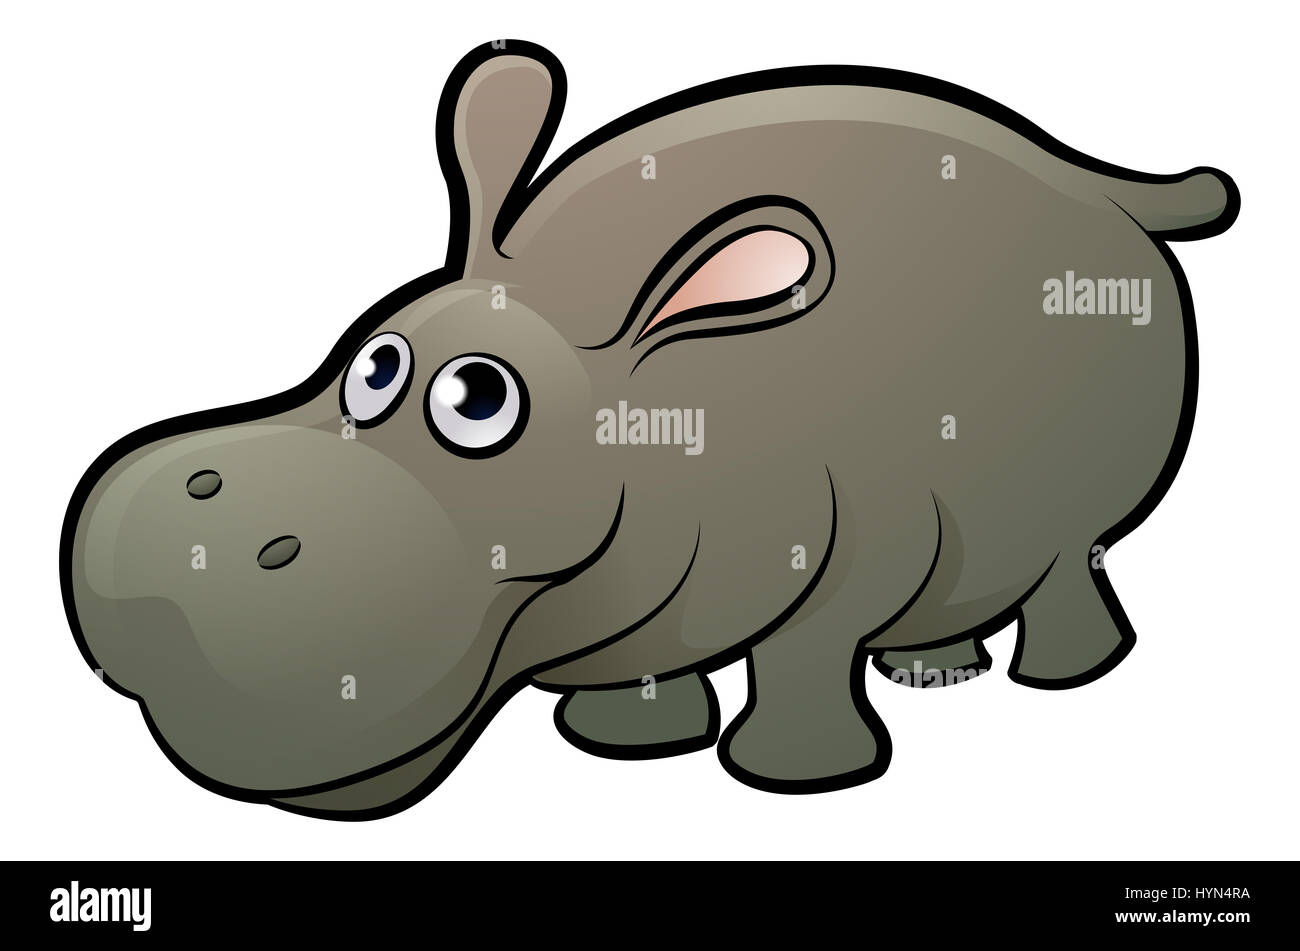 zoo animal cartoons stock photos zoo animal cartoons. Black Bedroom Furniture Sets. Home Design Ideas